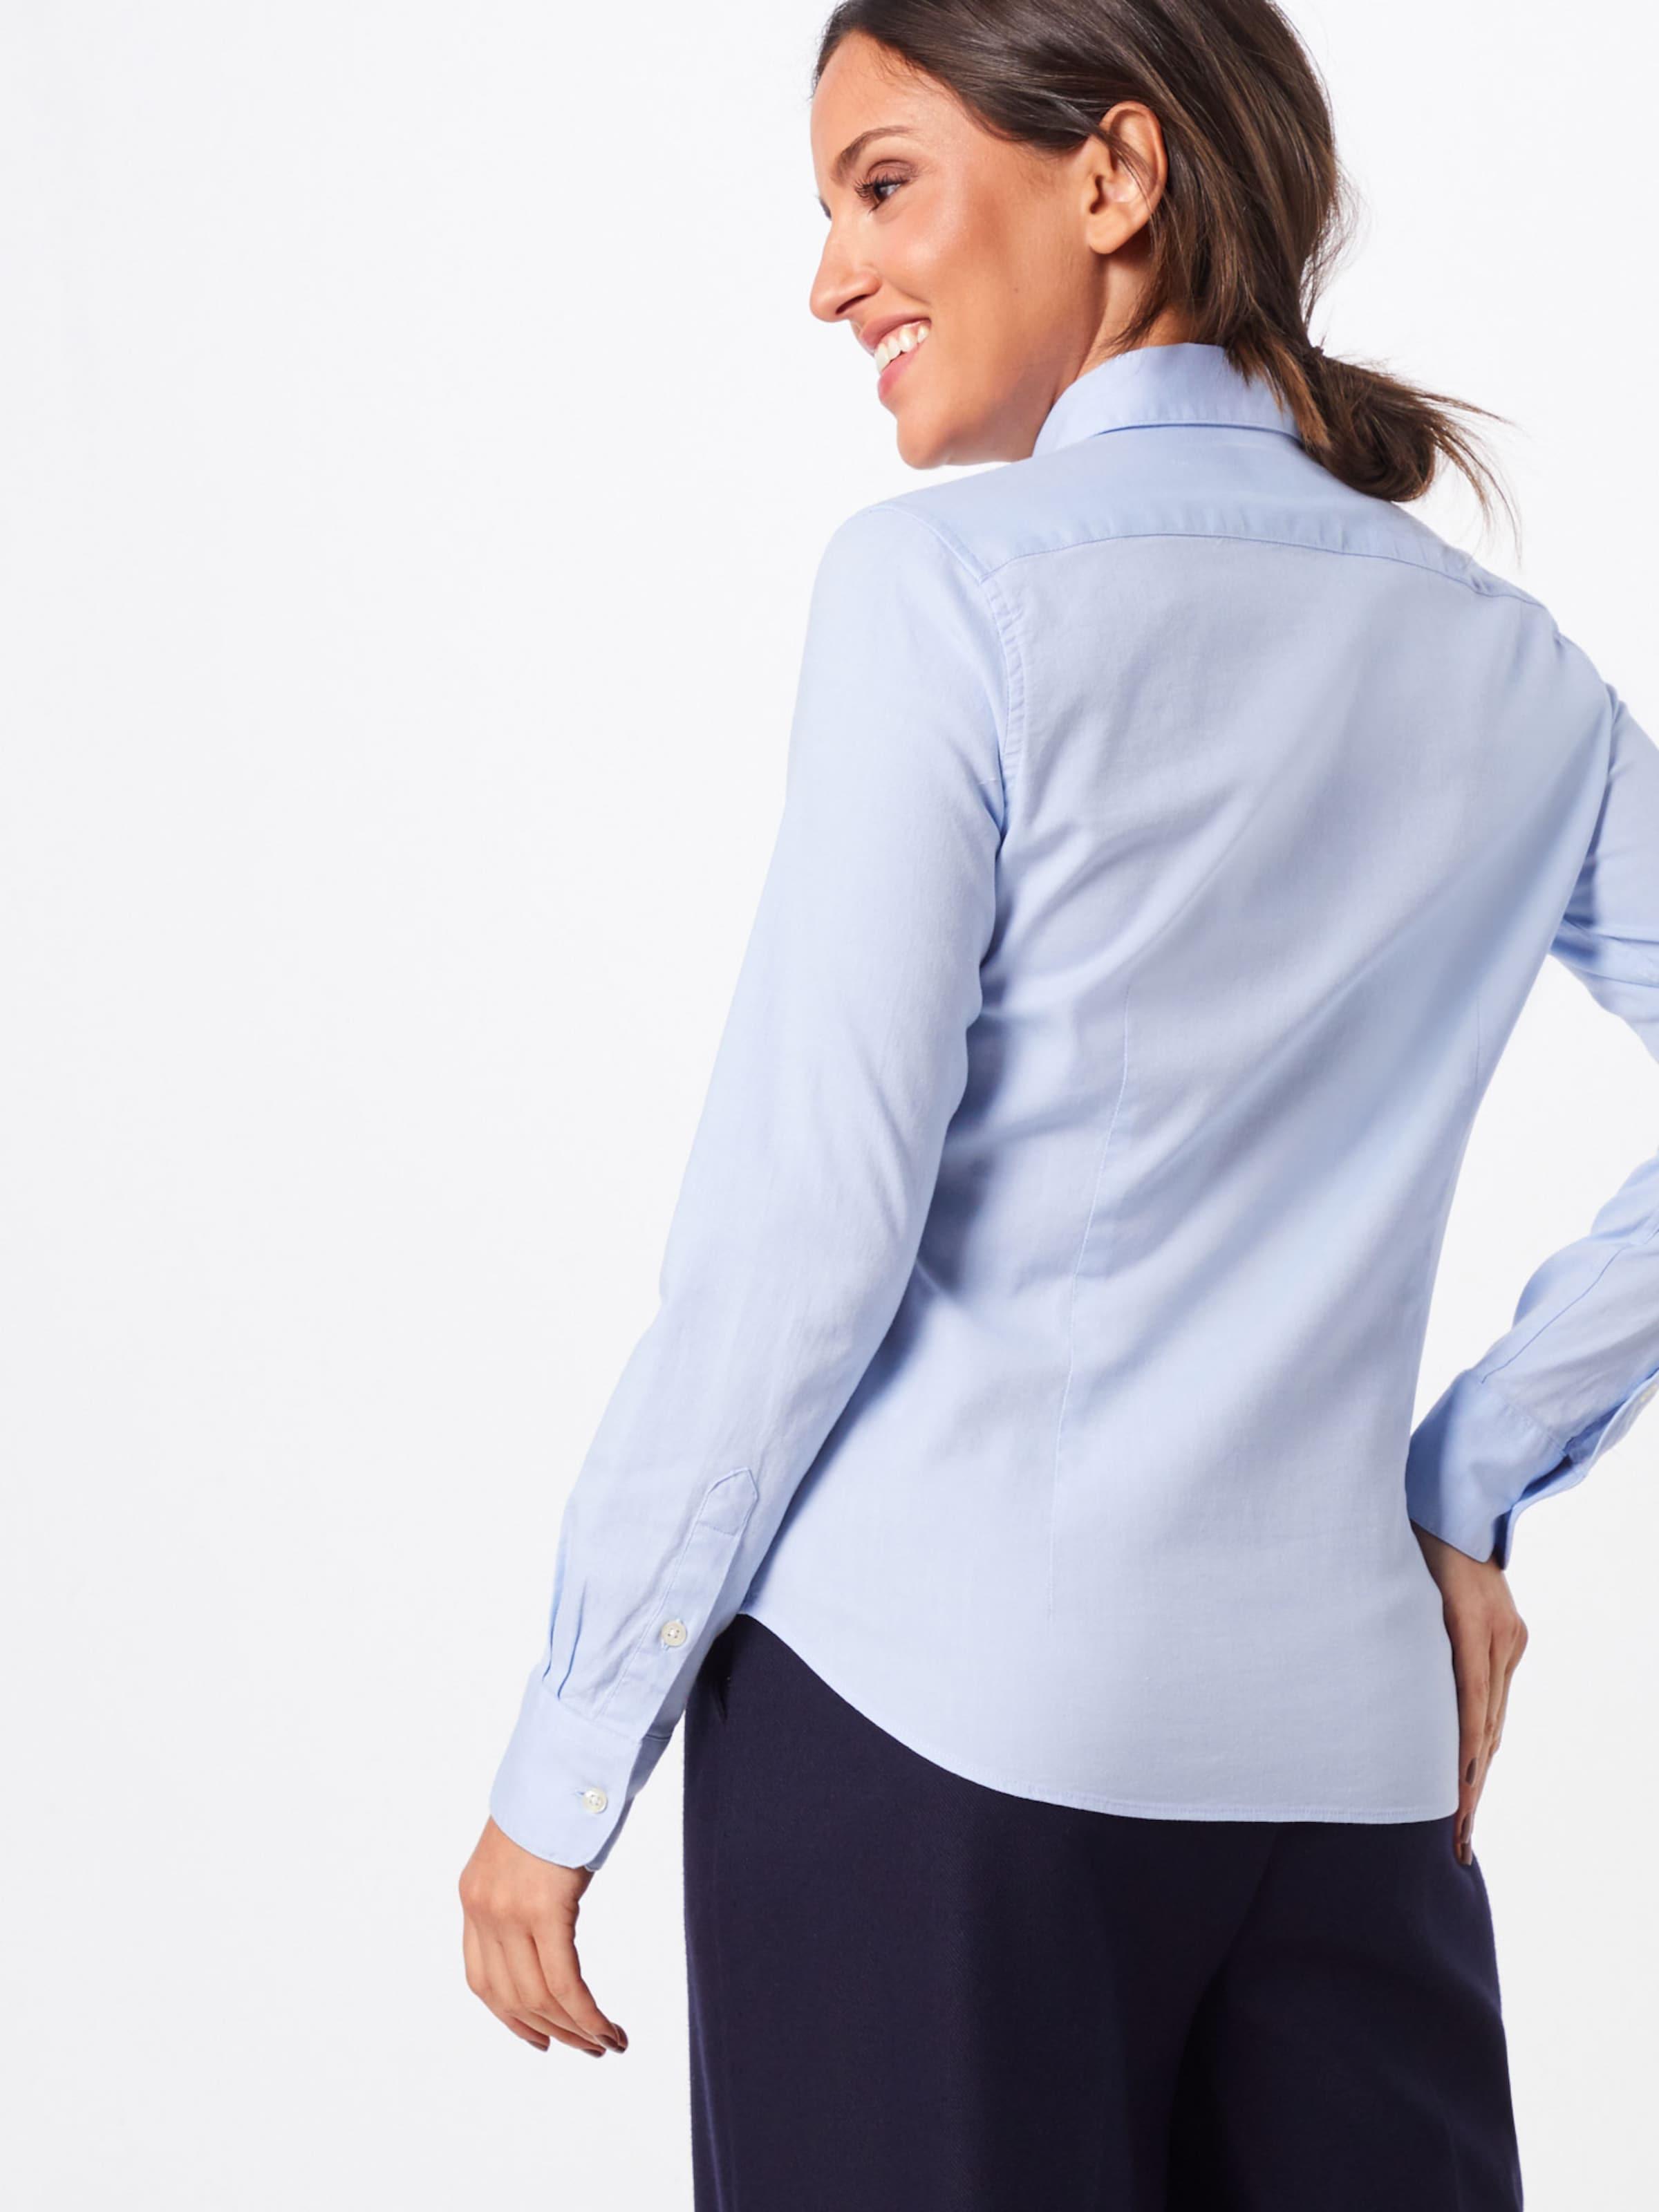 50 En Bleu 'shirt L Chemisier 30 Str' La s 1 Oxford Clair Martina 2 eWED2I9bHY